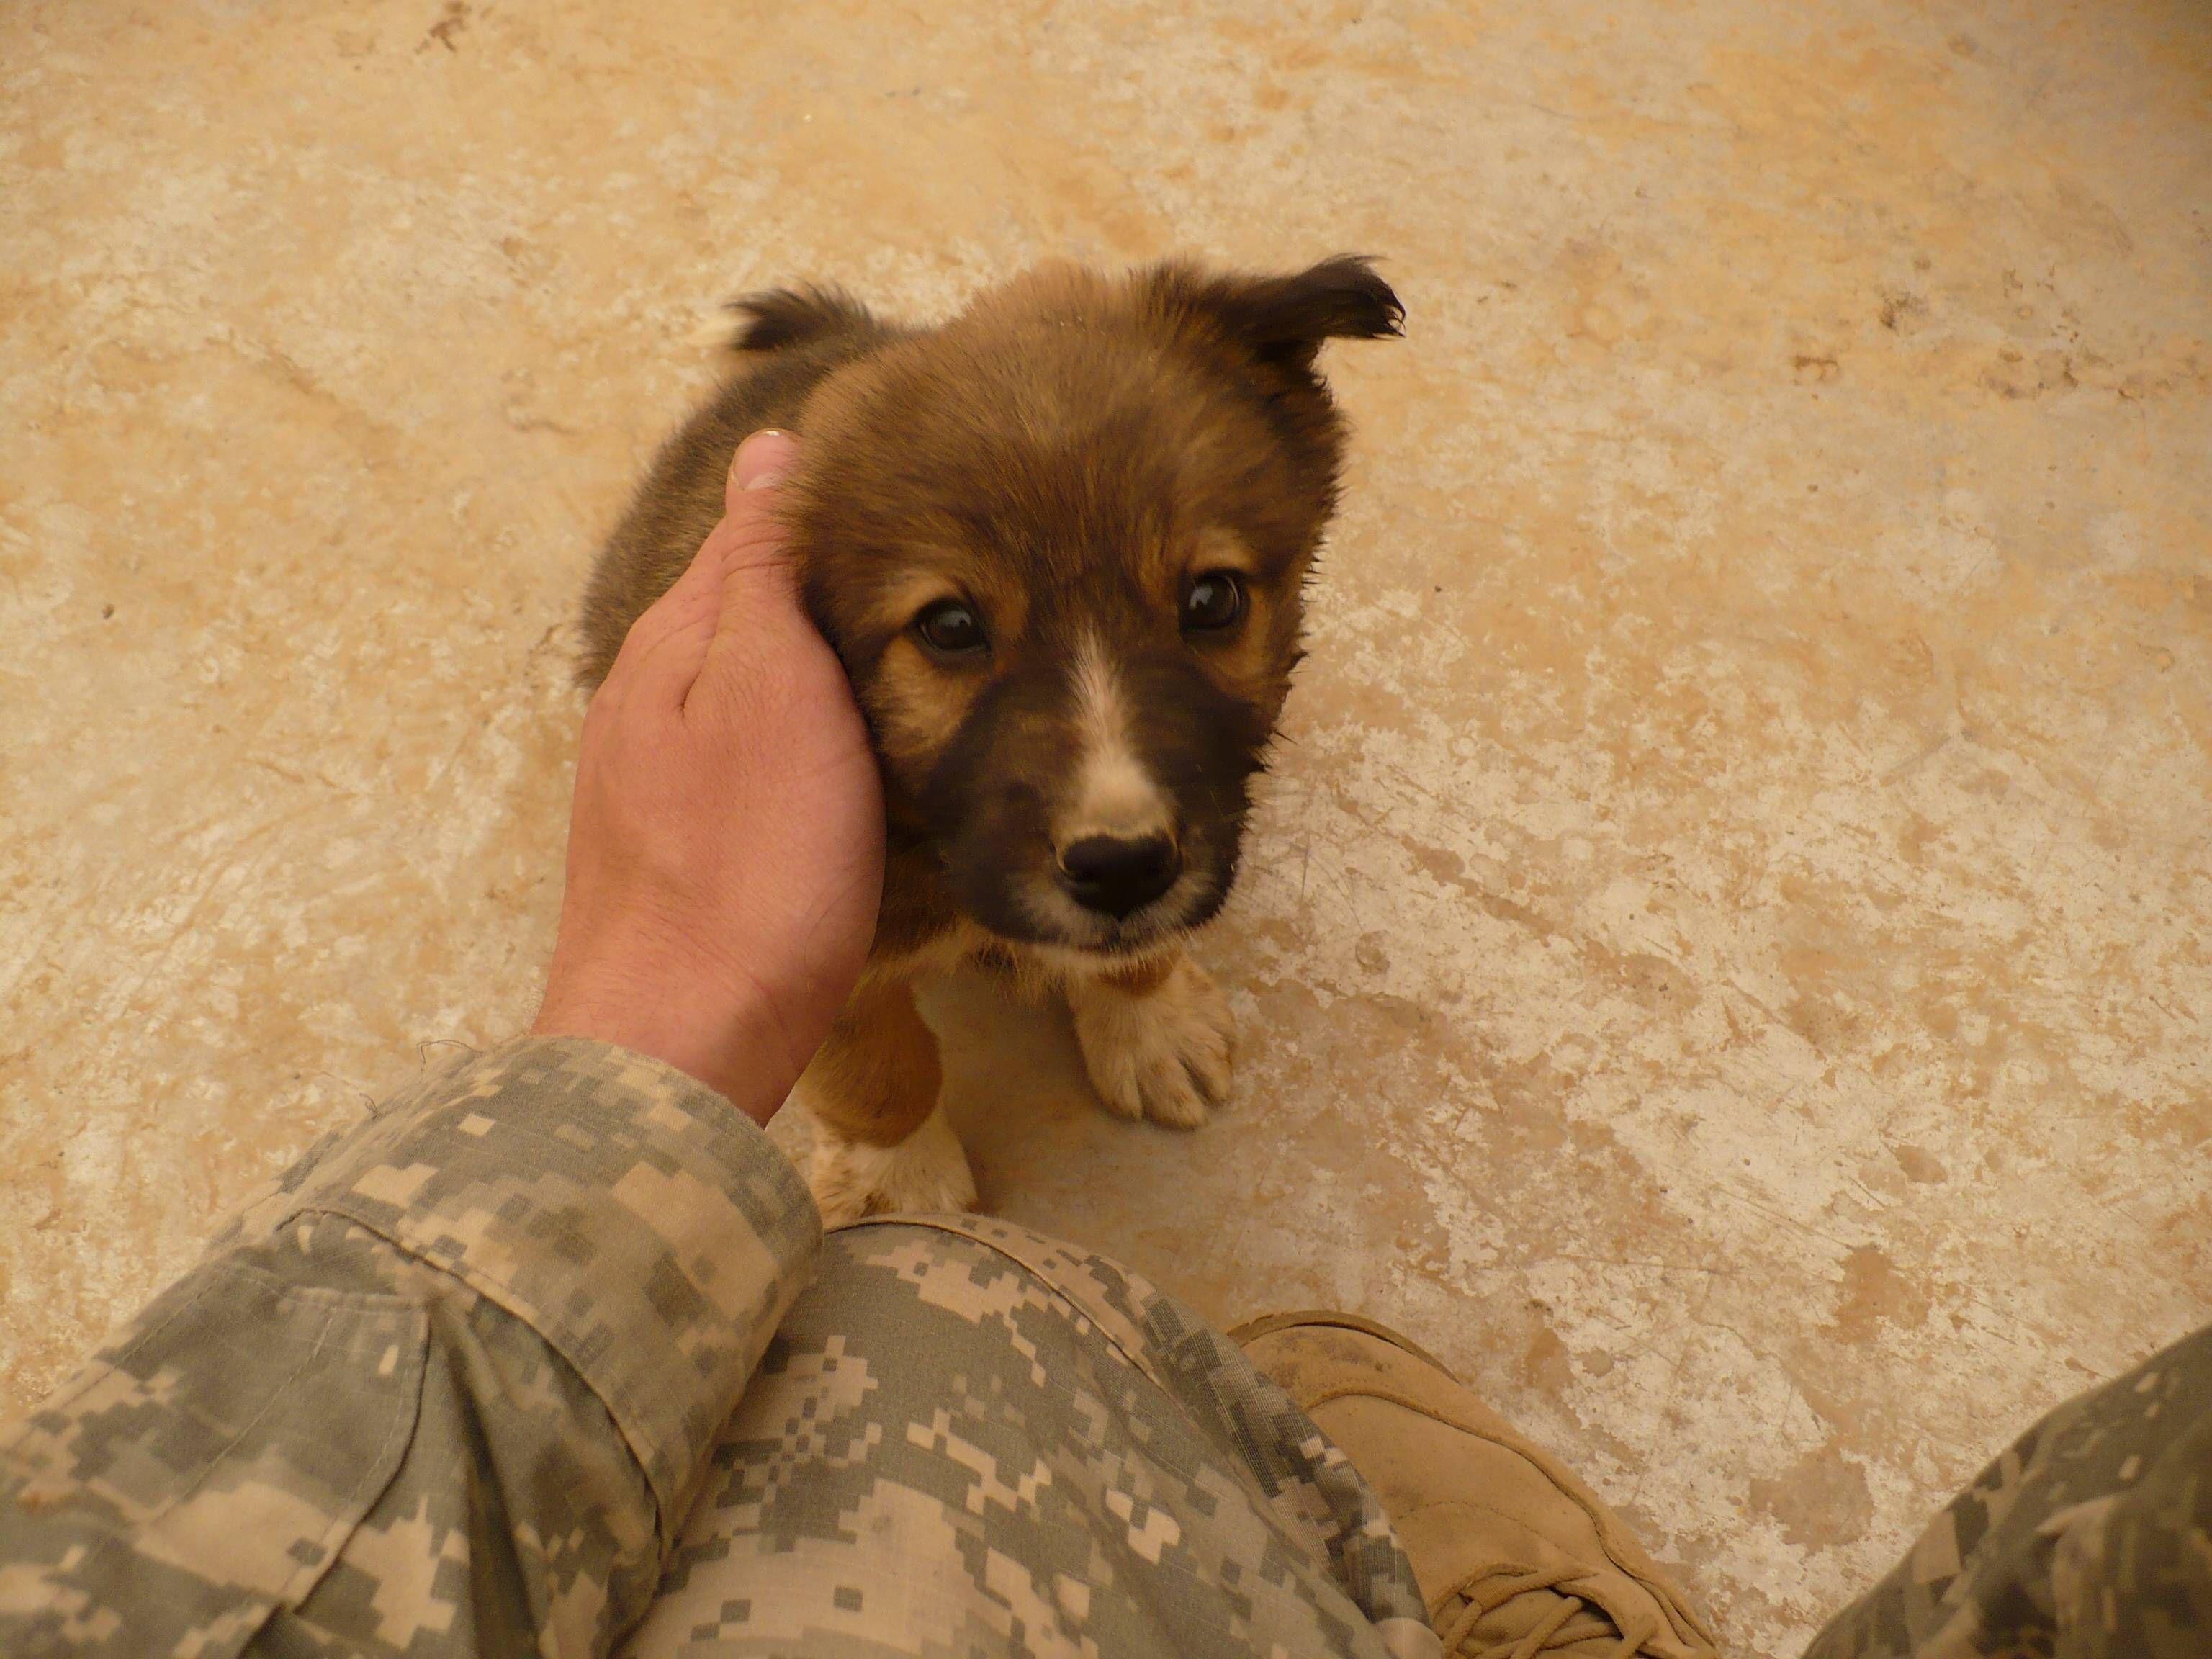 Most Inspiring War Army Adorable Dog - df7f93516de2f541a844767e2bf8bdb4  Trends_514433  .jpg